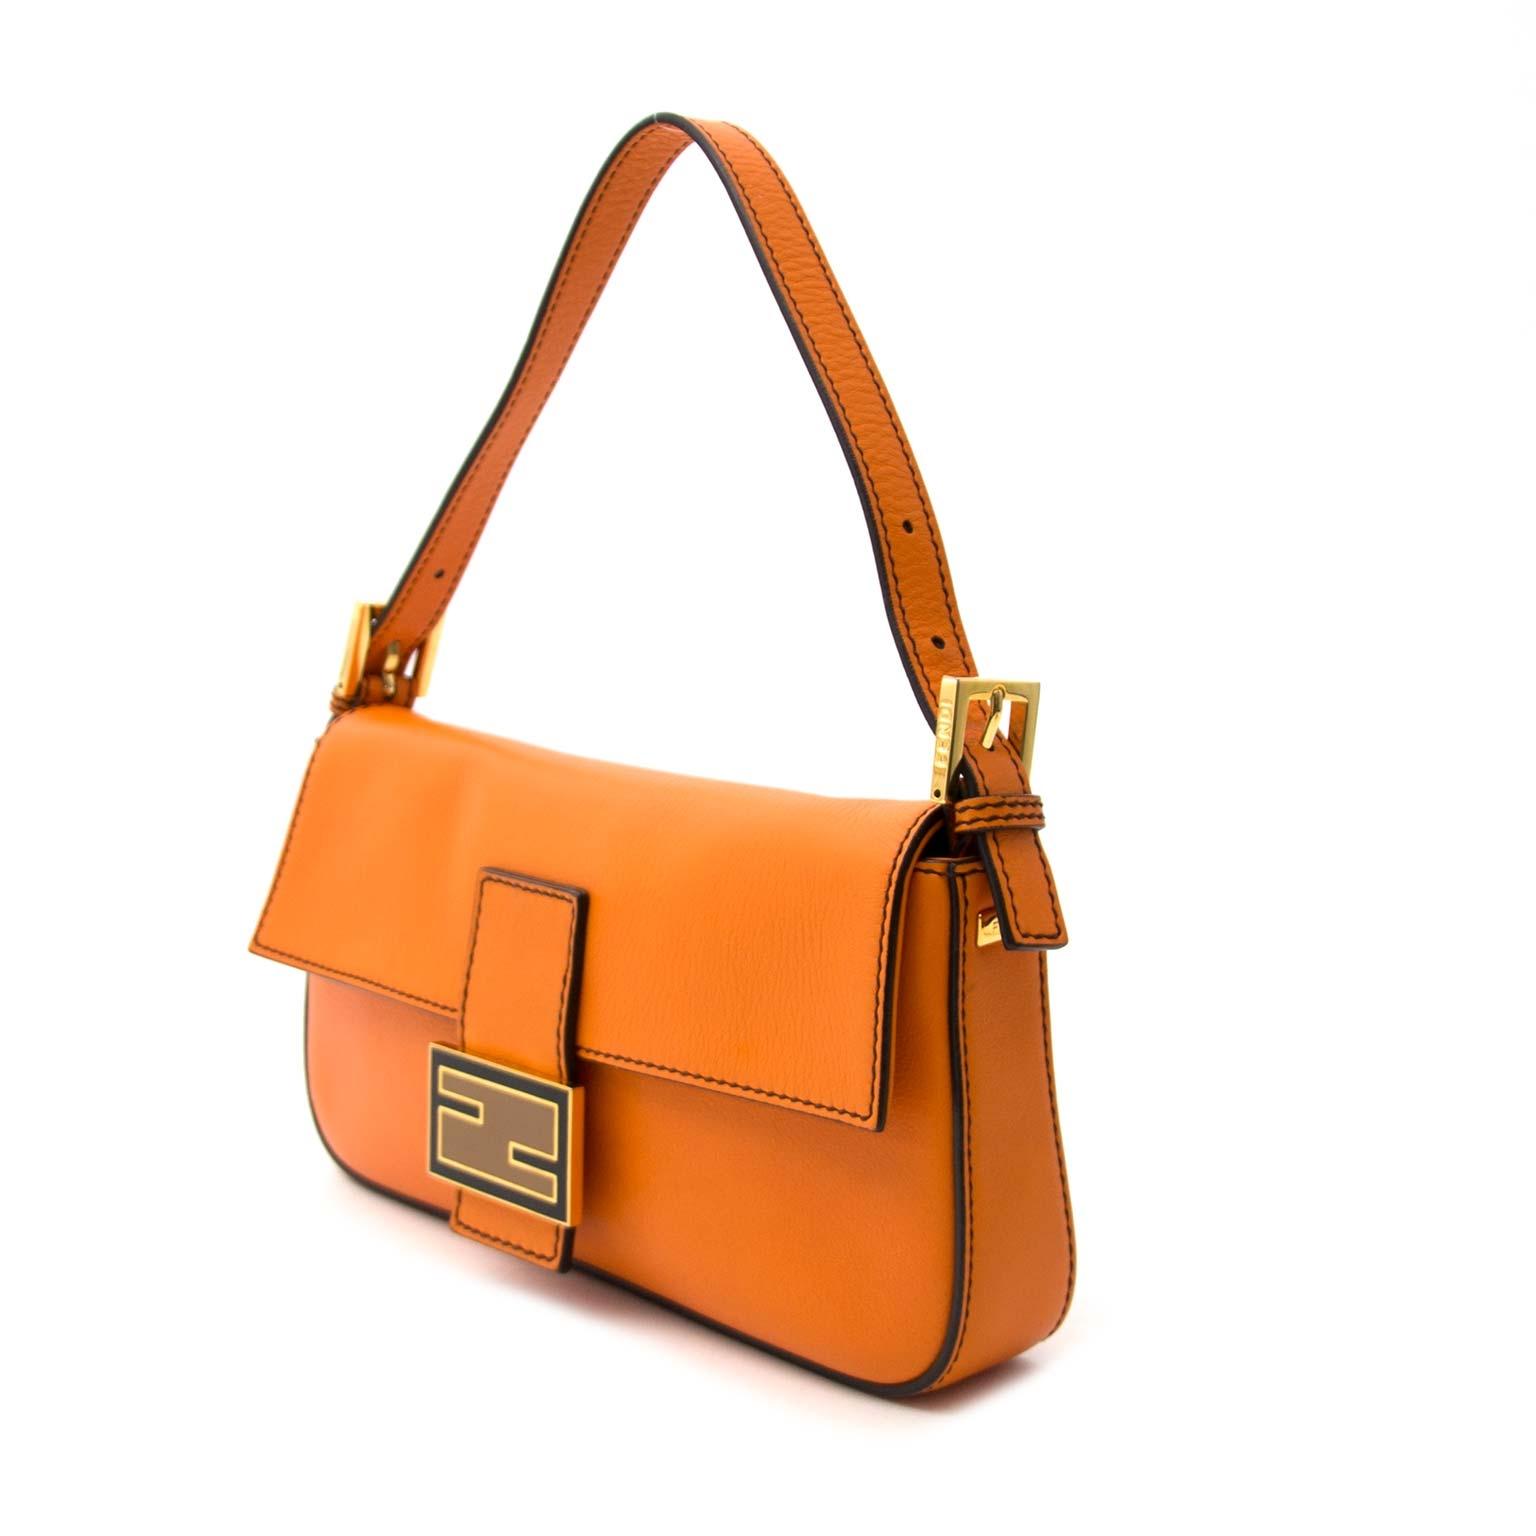 117c4cd6e7f ... Fendi Orange Baguette Shoulder Bag Buy authentic designer Fendi  secondhand bags at Labellov at the best